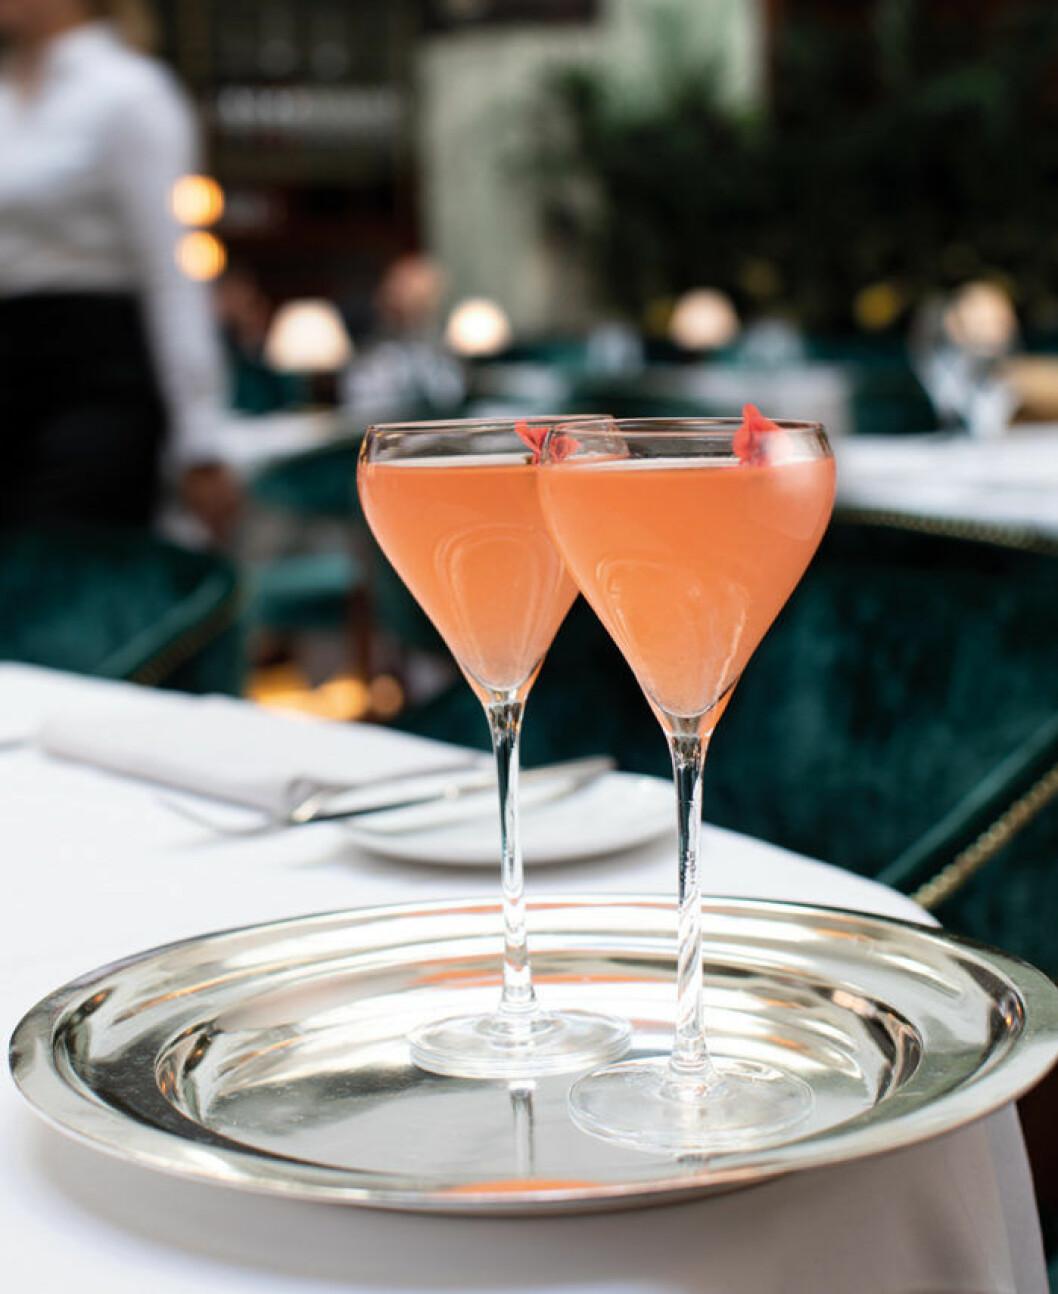 Den alkoholfria drinken Sunset från Bank Hotel.